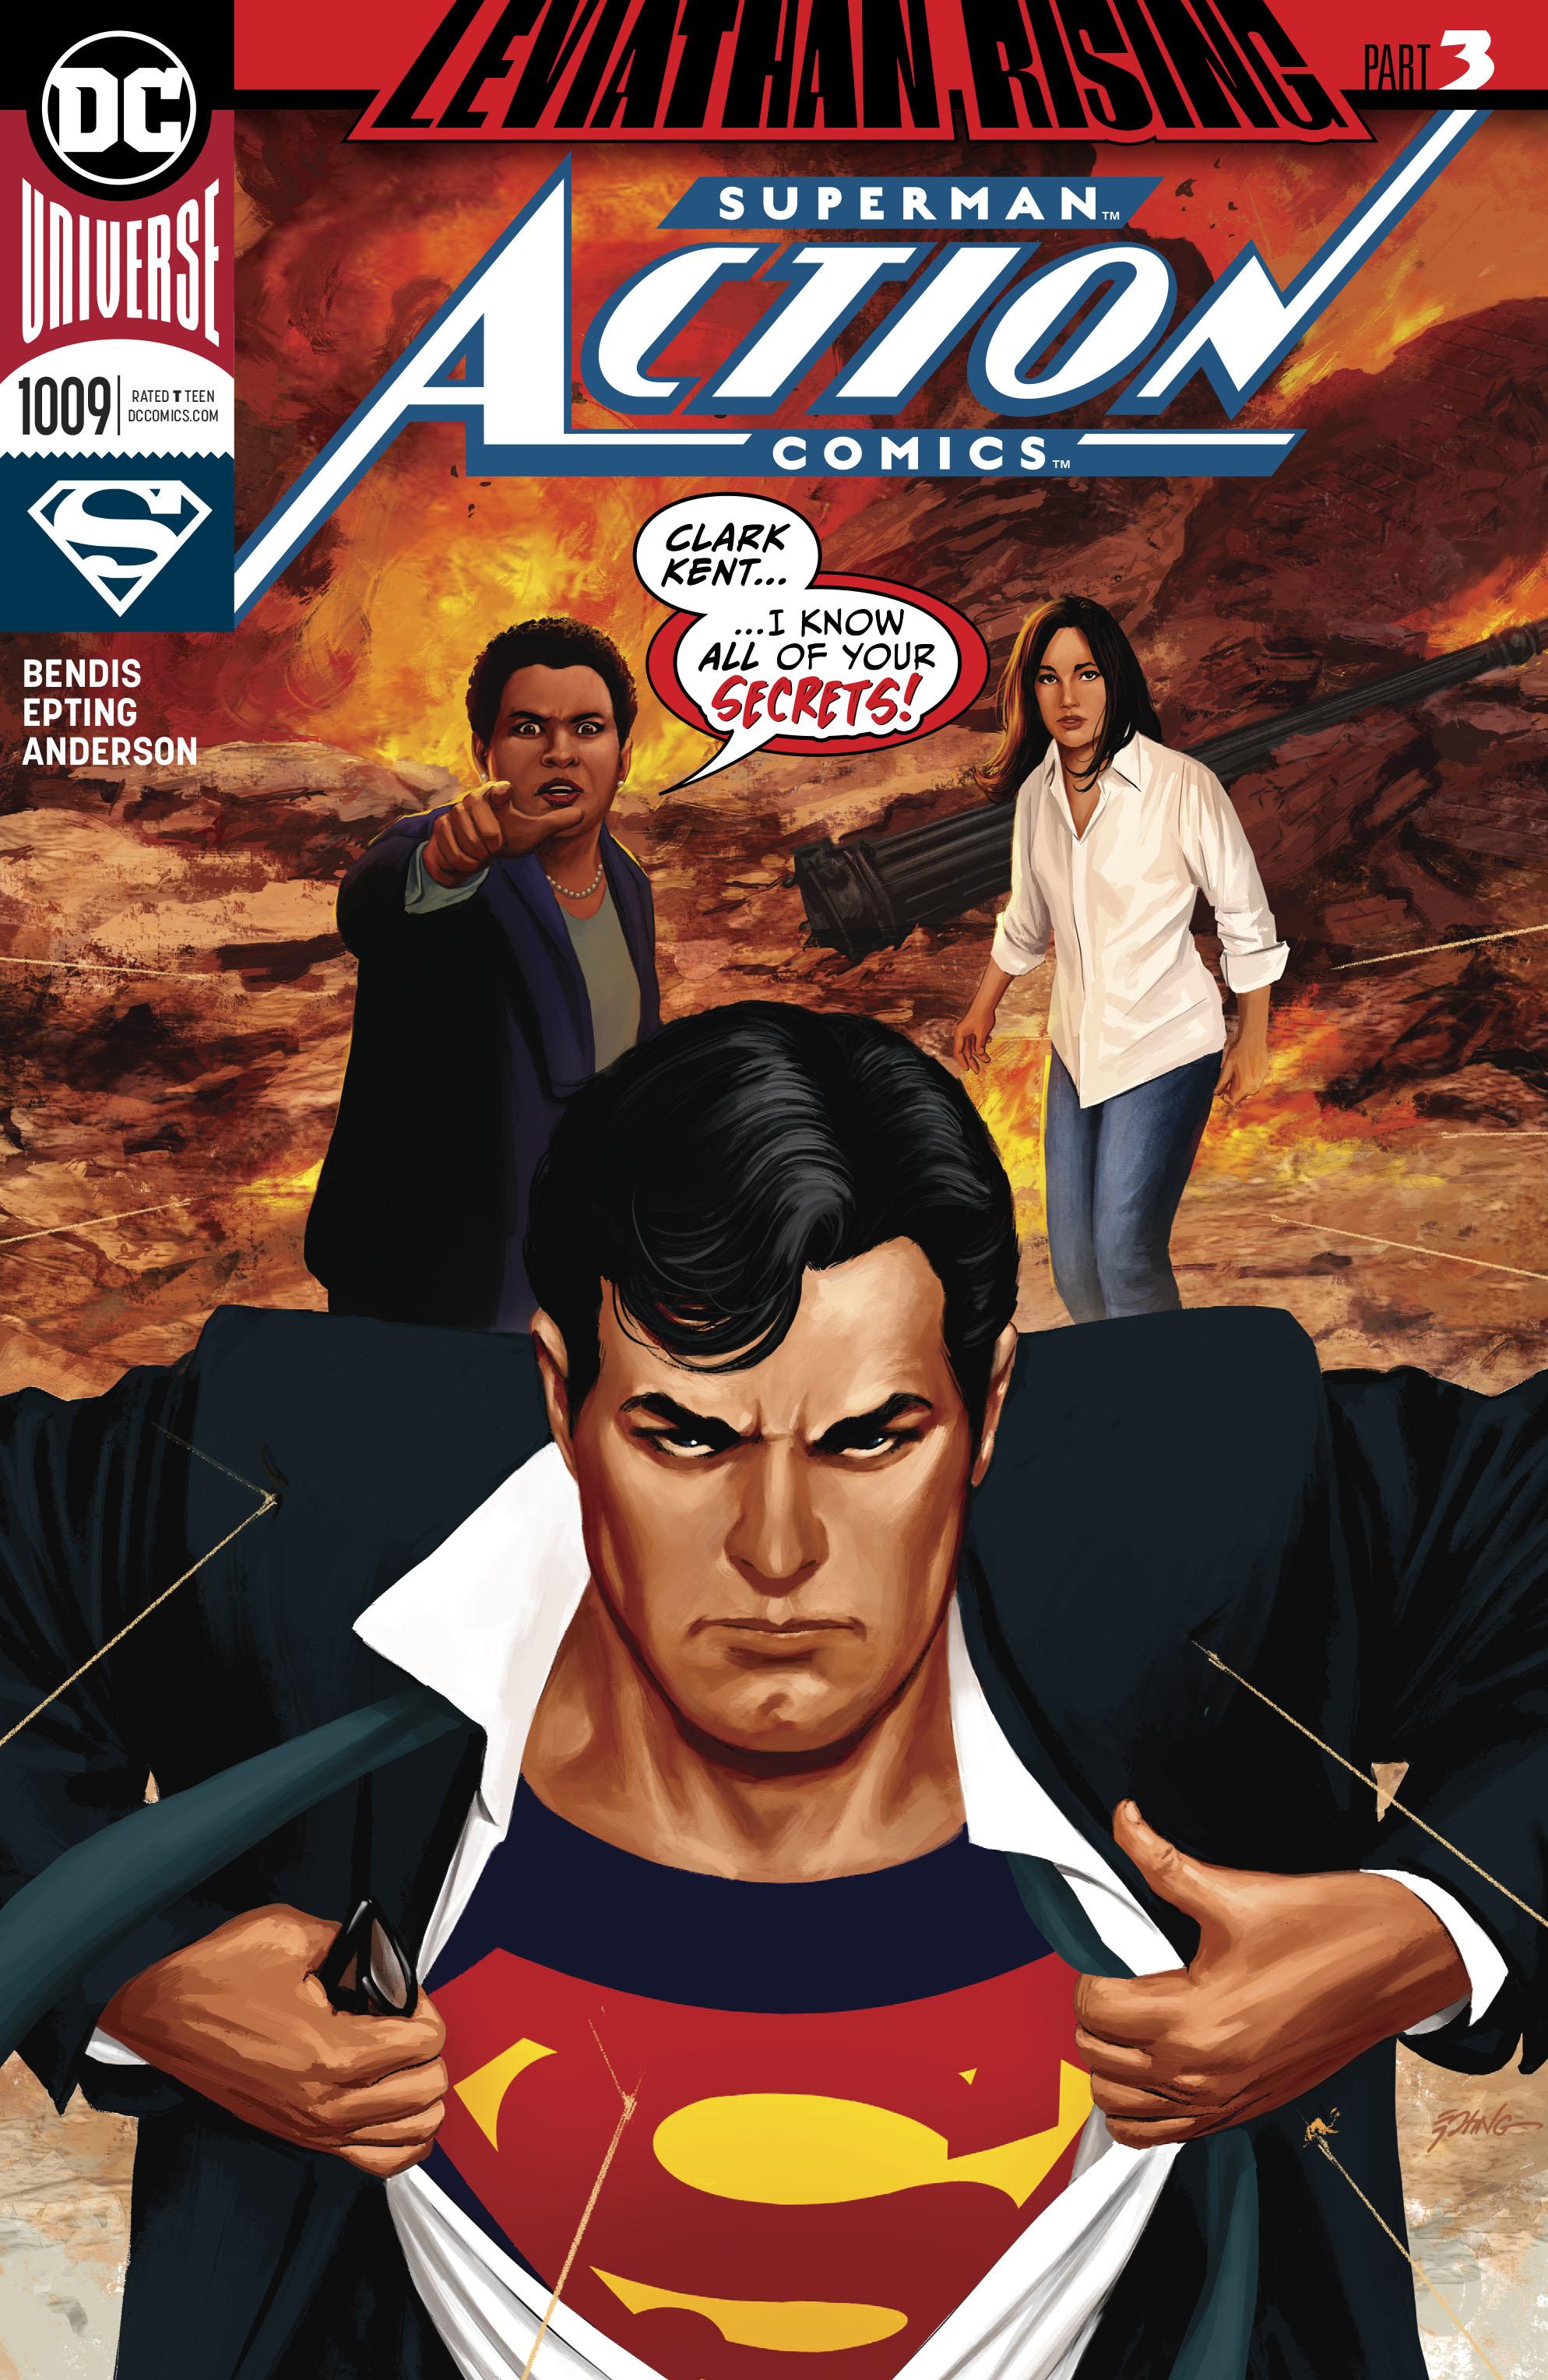 Action Comics #1009.jpg